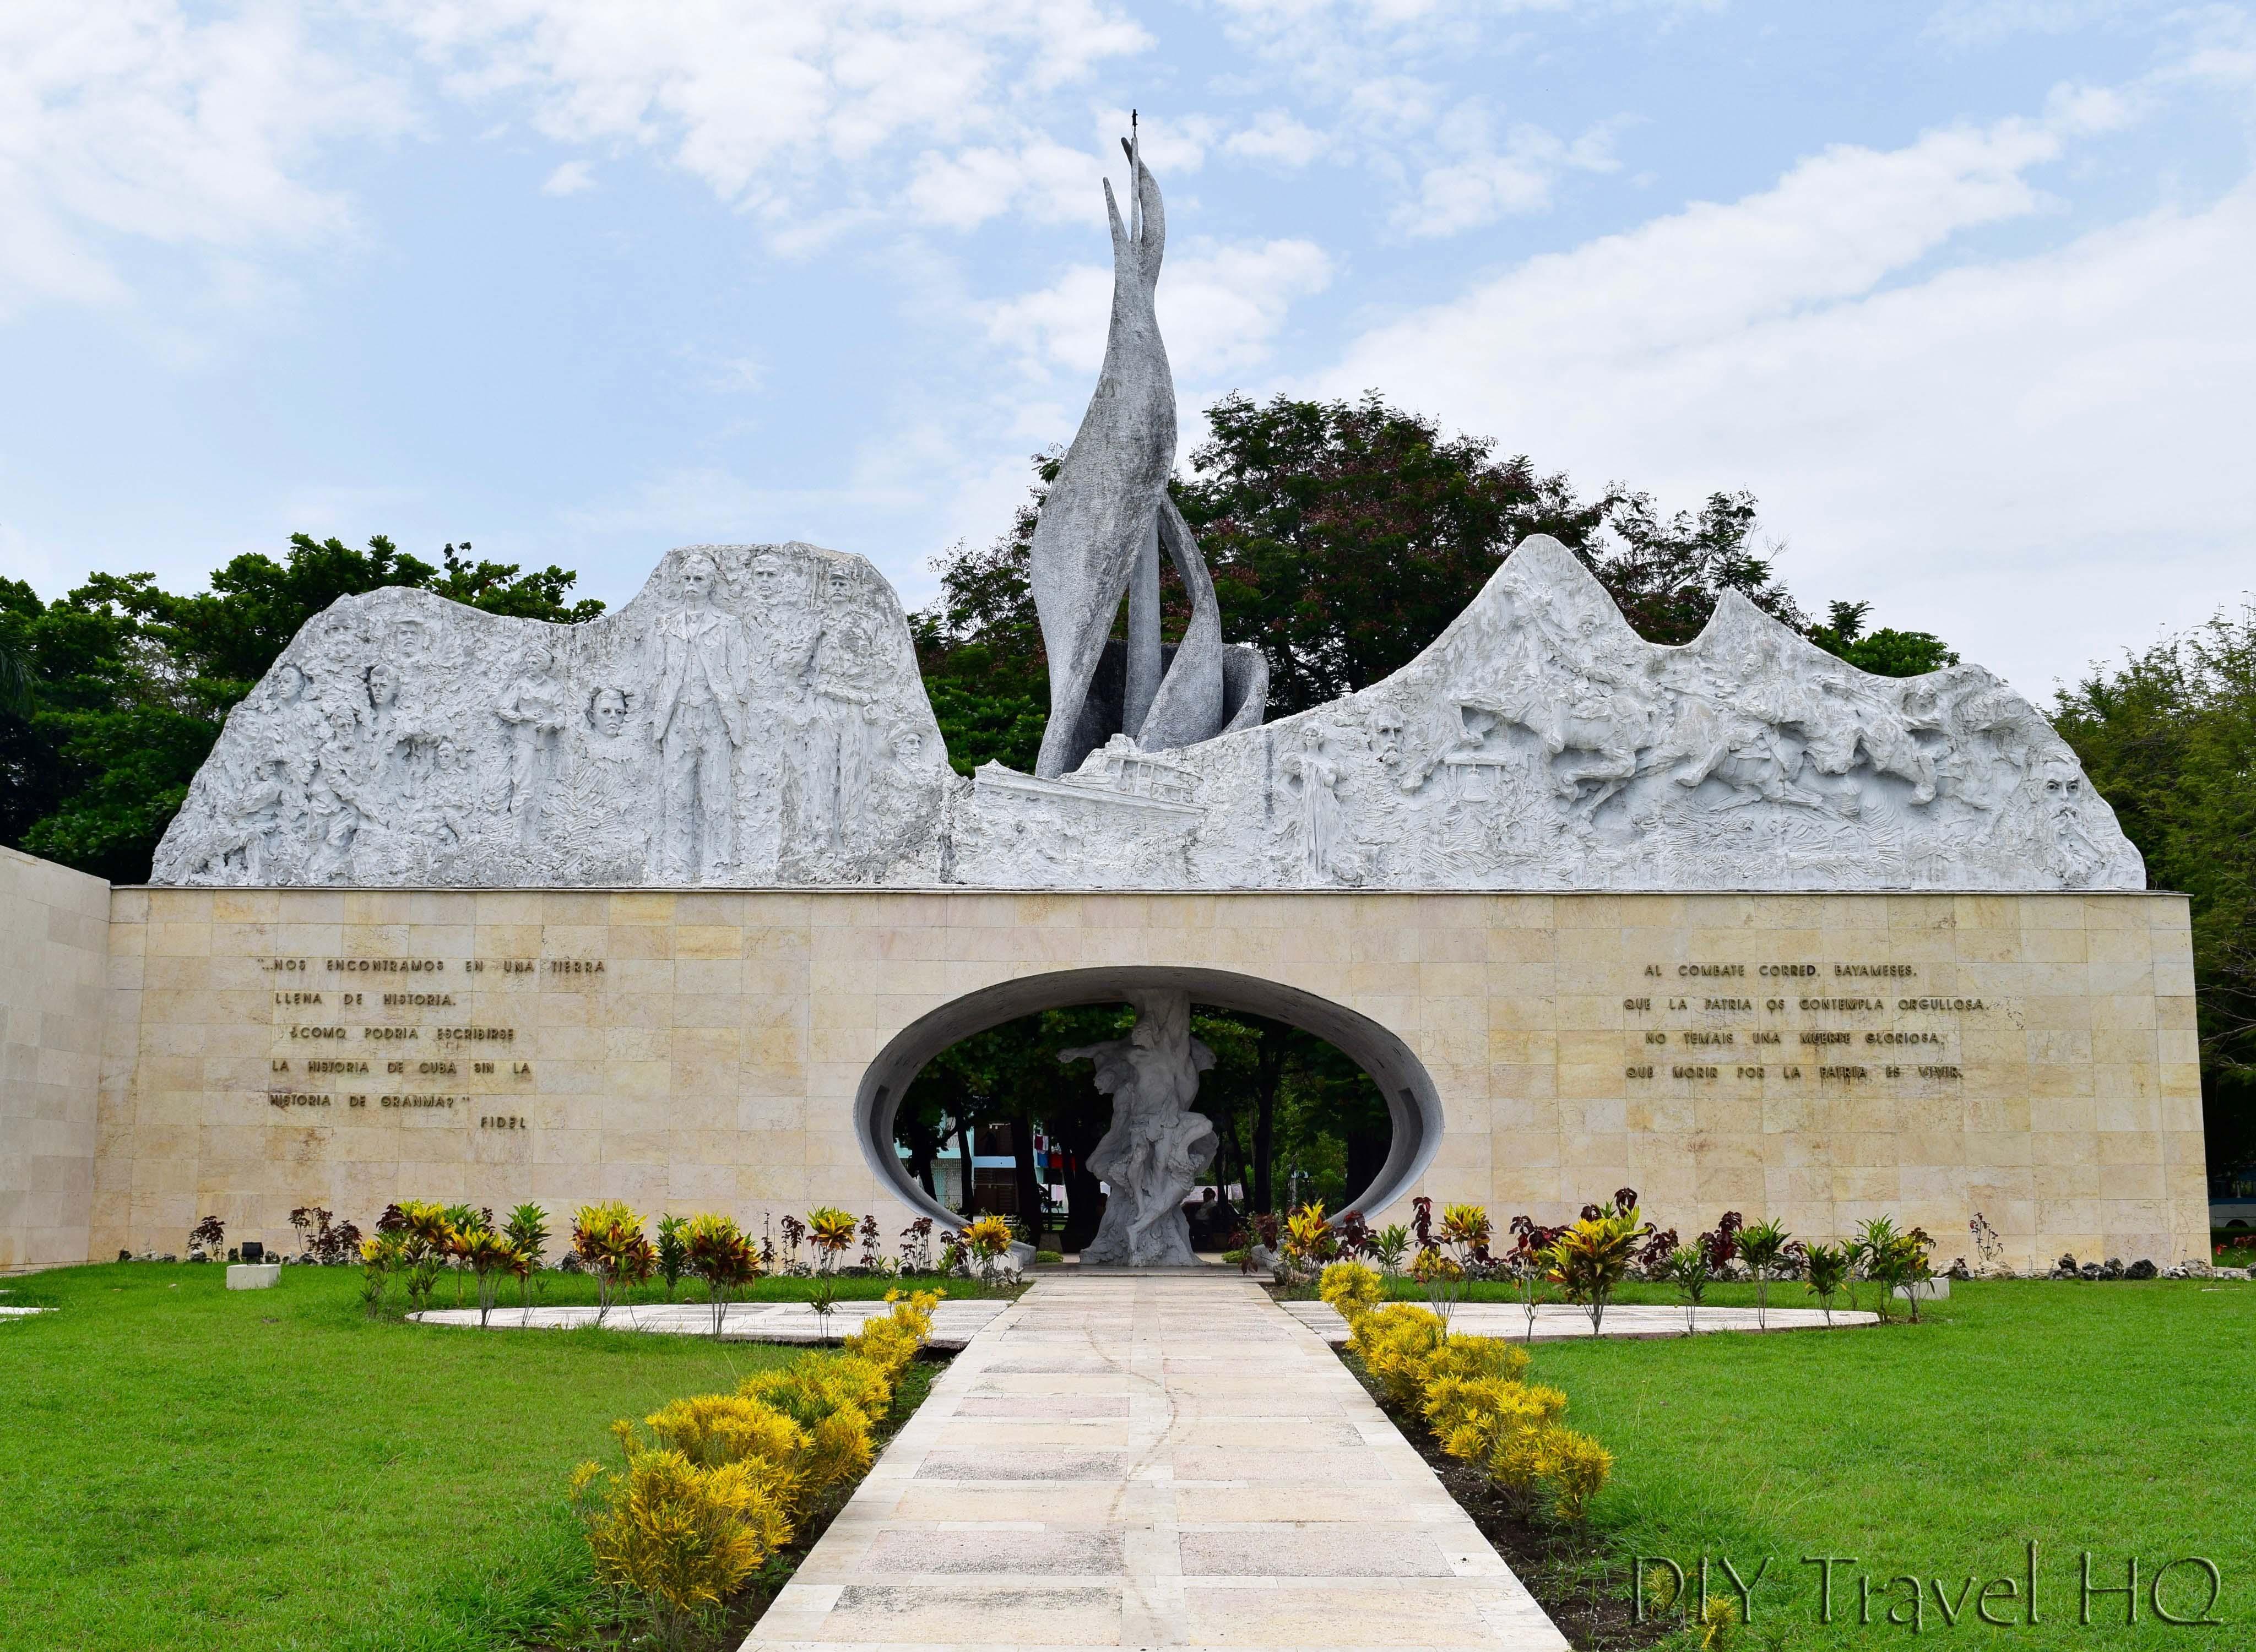 Bayamo: Birthplace of Cuban Independence - DIY Travel HQ